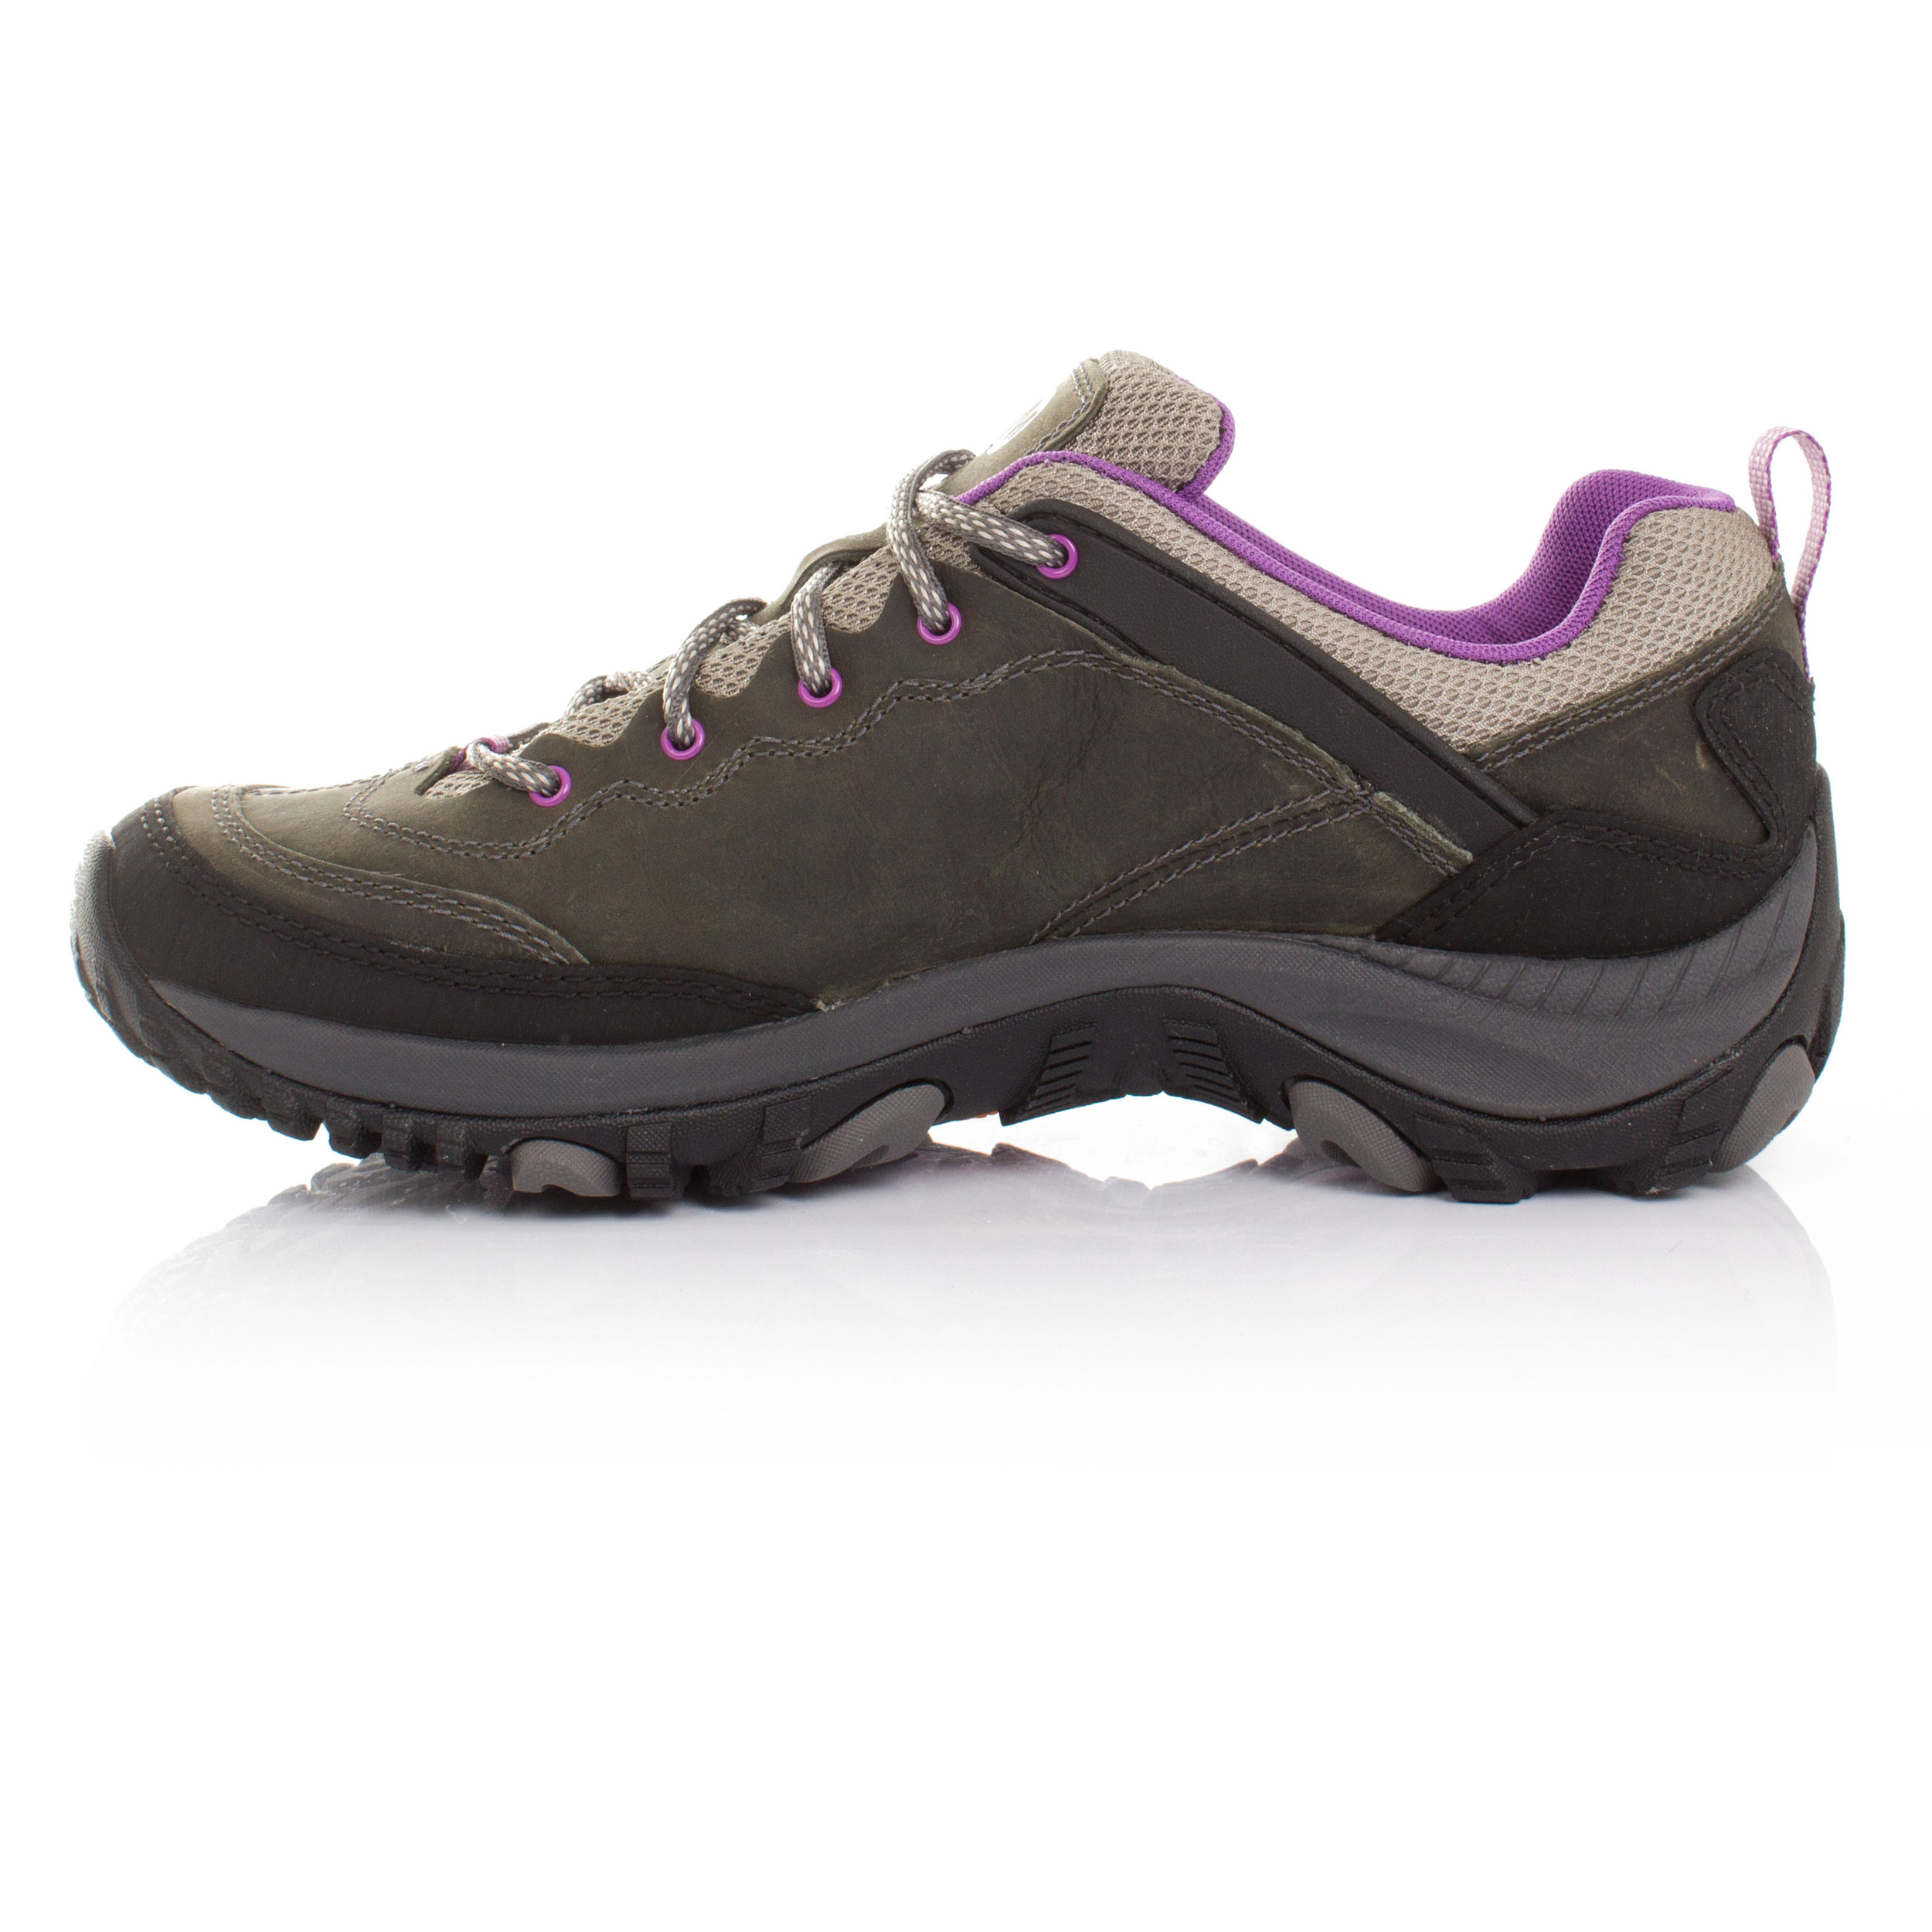 Gris Trekker Zapatos Running Trail Merrell Salida Mujer Zapatillas BSRTxTOn